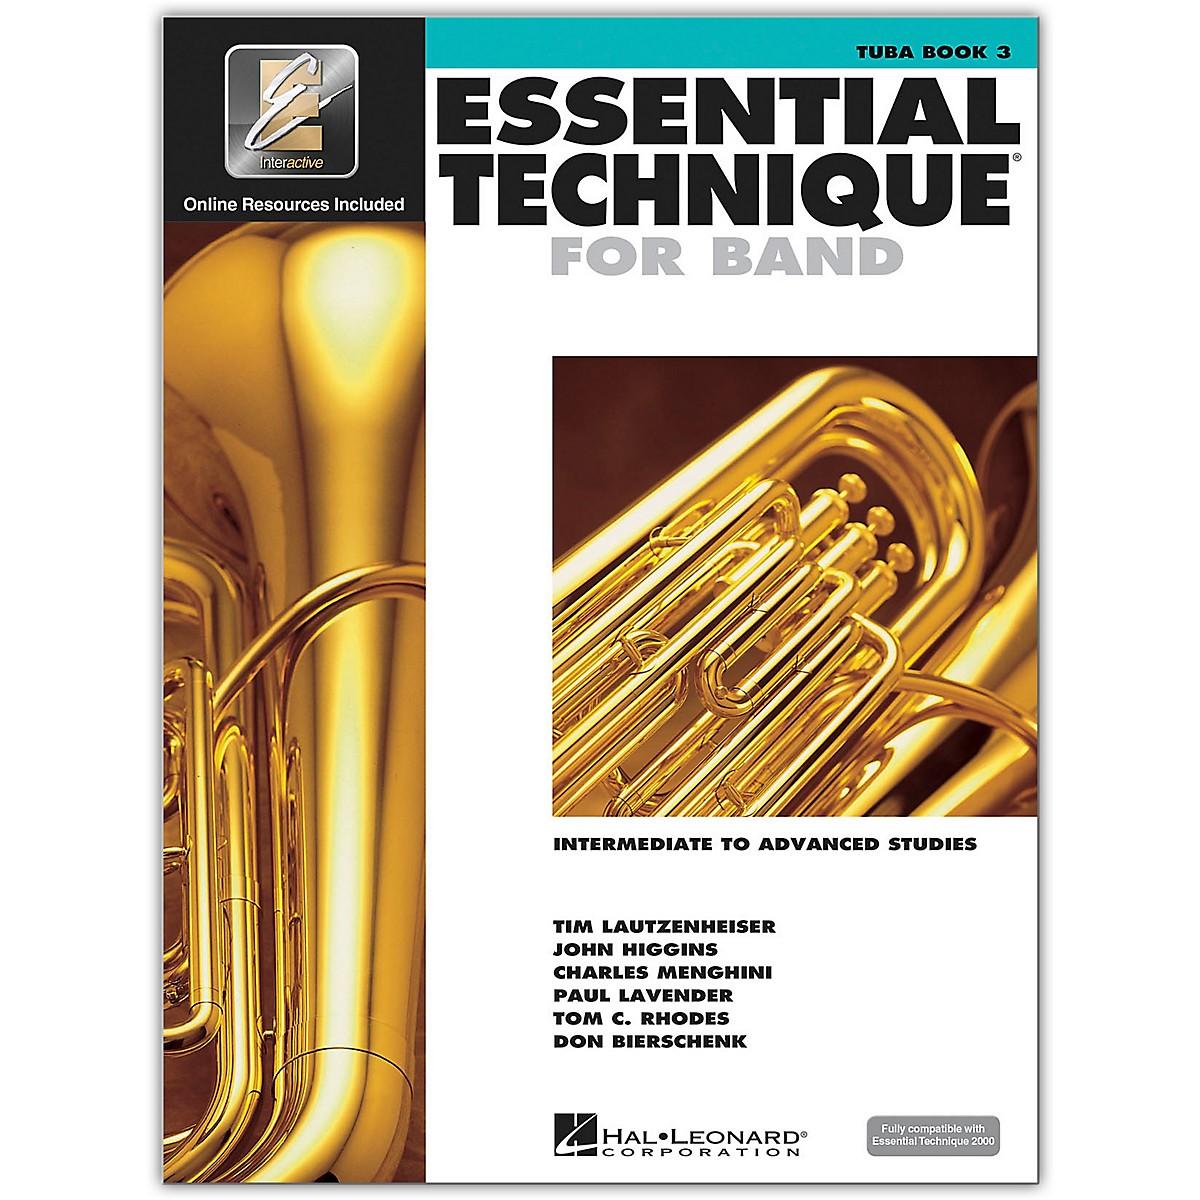 Hal Leonard Essential Technique for Band - Tuba 3 Book/Online Audio